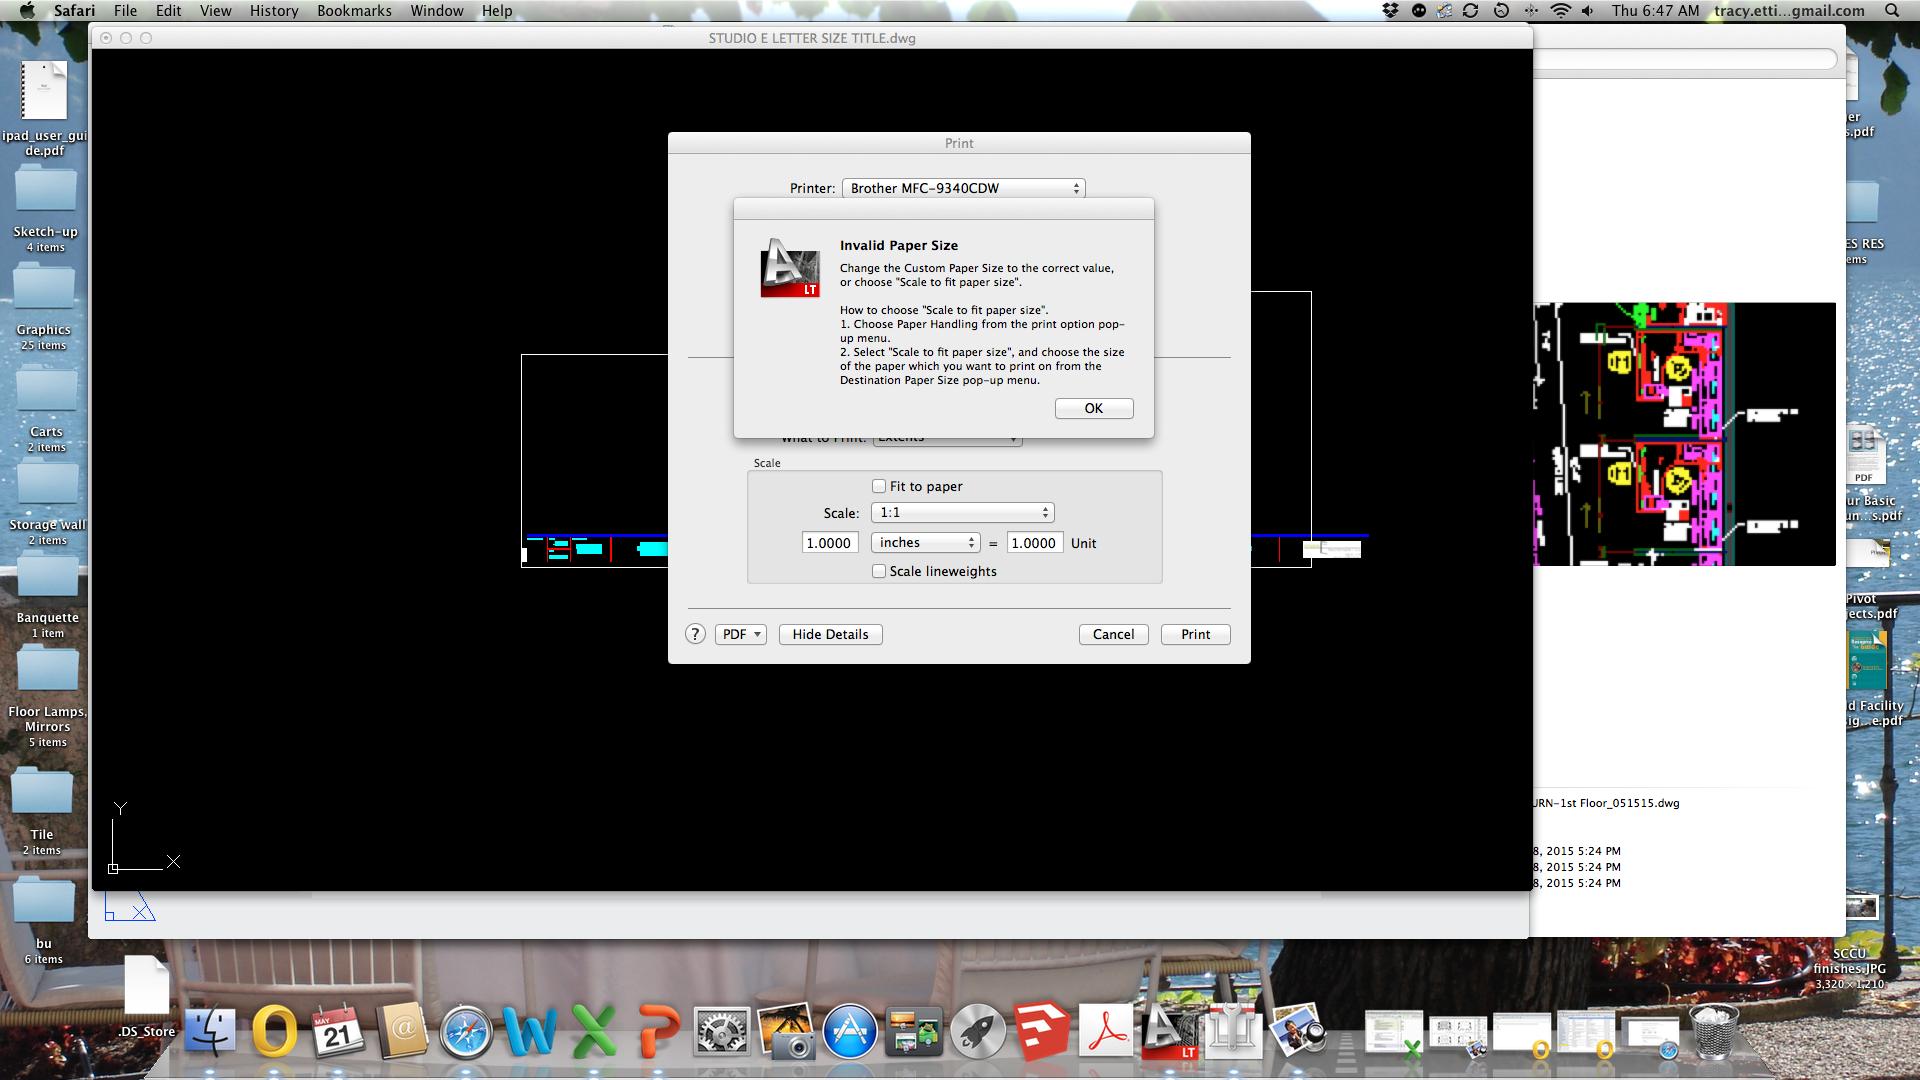 Automate conversion to TIFF, JPEG, Adobe PDF